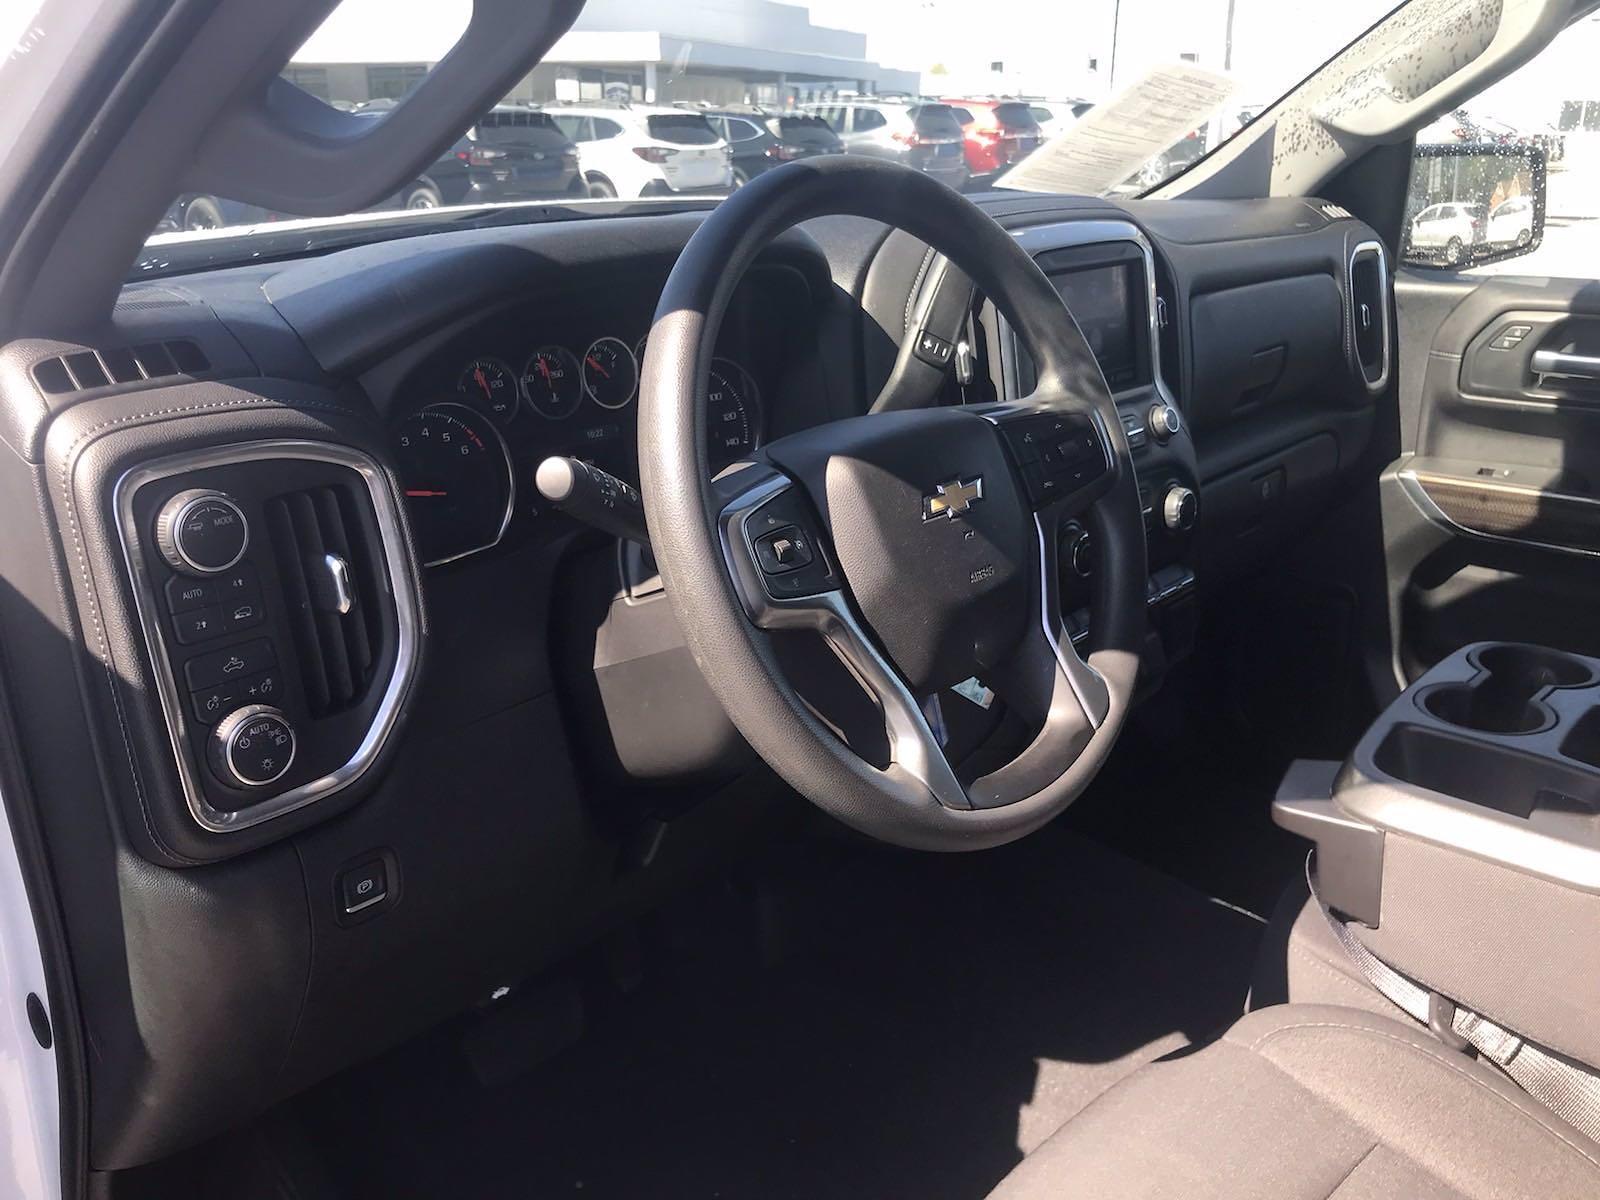 2020 Chevrolet Silverado 1500 Crew Cab 4x4, Pickup #16423PN - photo 22